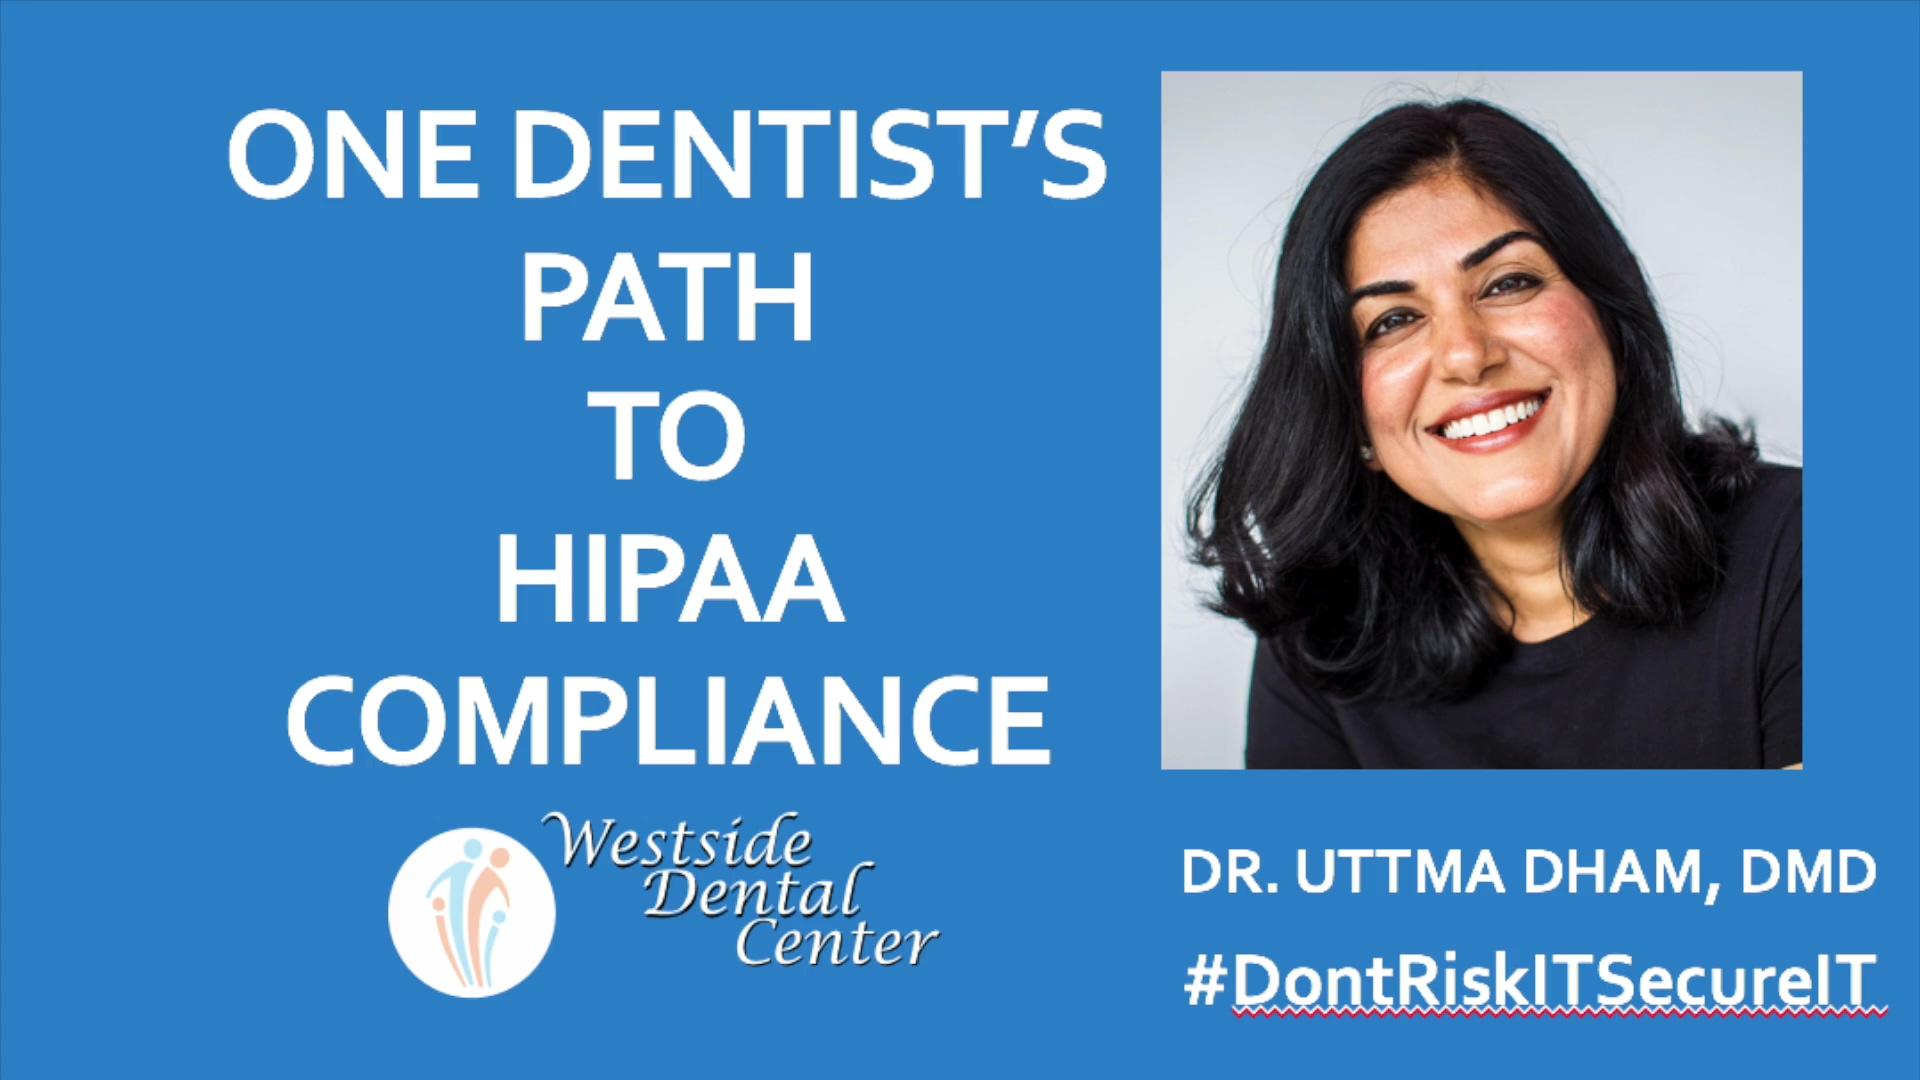 Dr Dham Path to HIPAA Compliance Aug 2018